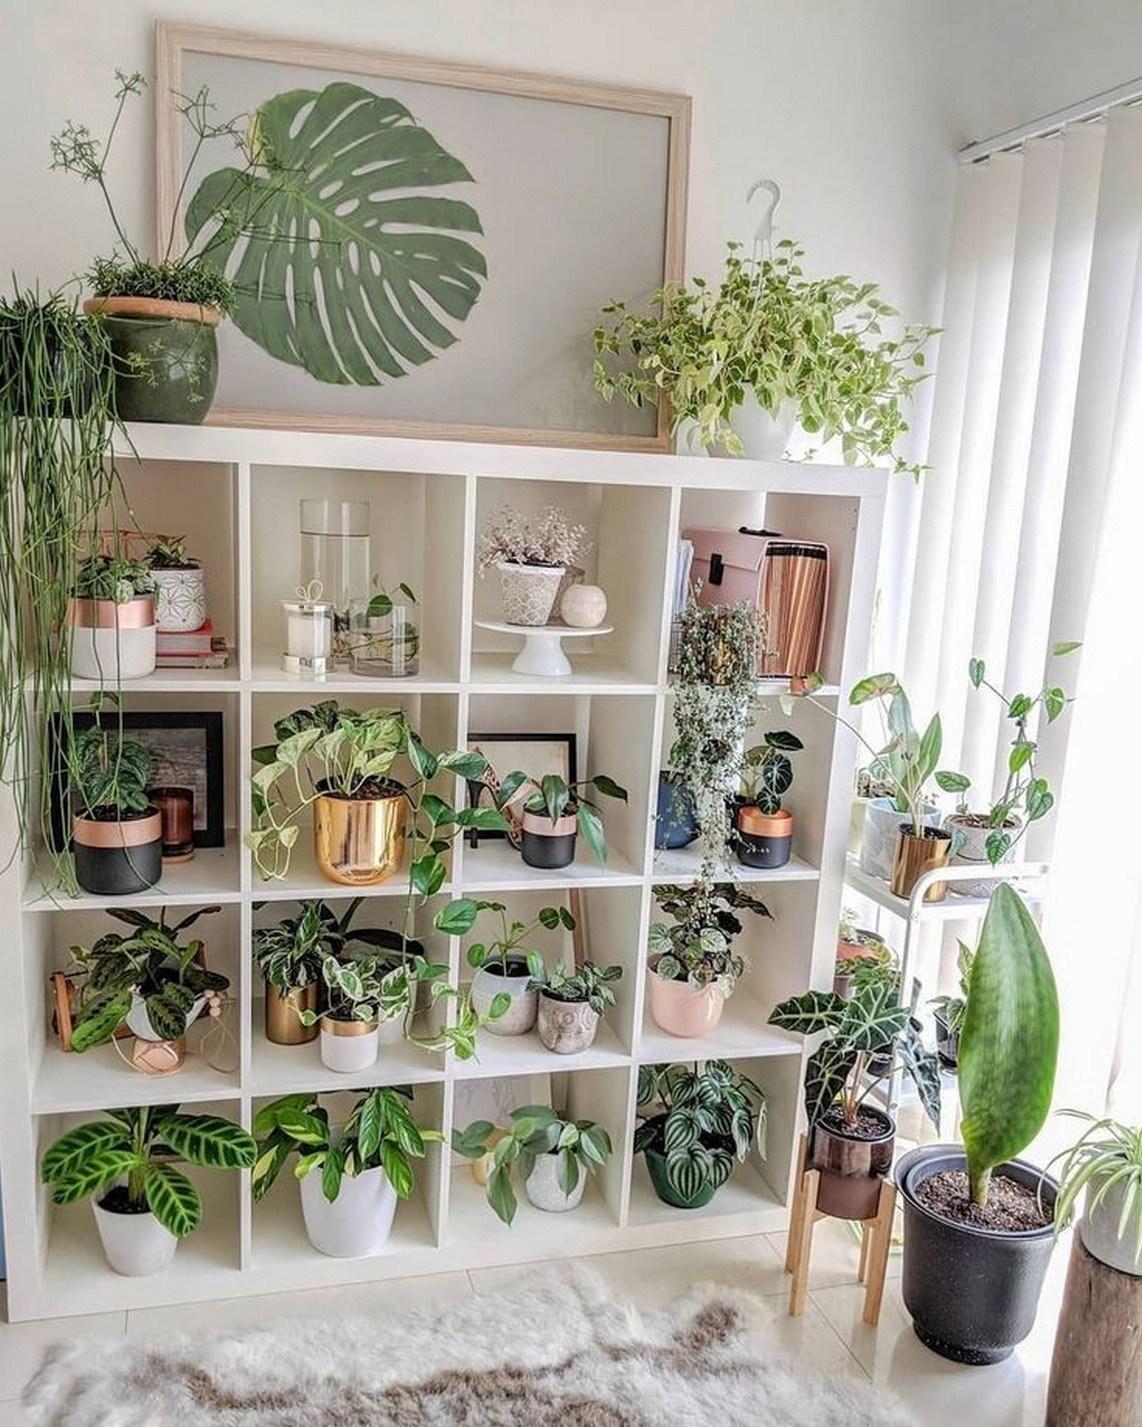 creer jardin interieur organiser plantes vertes